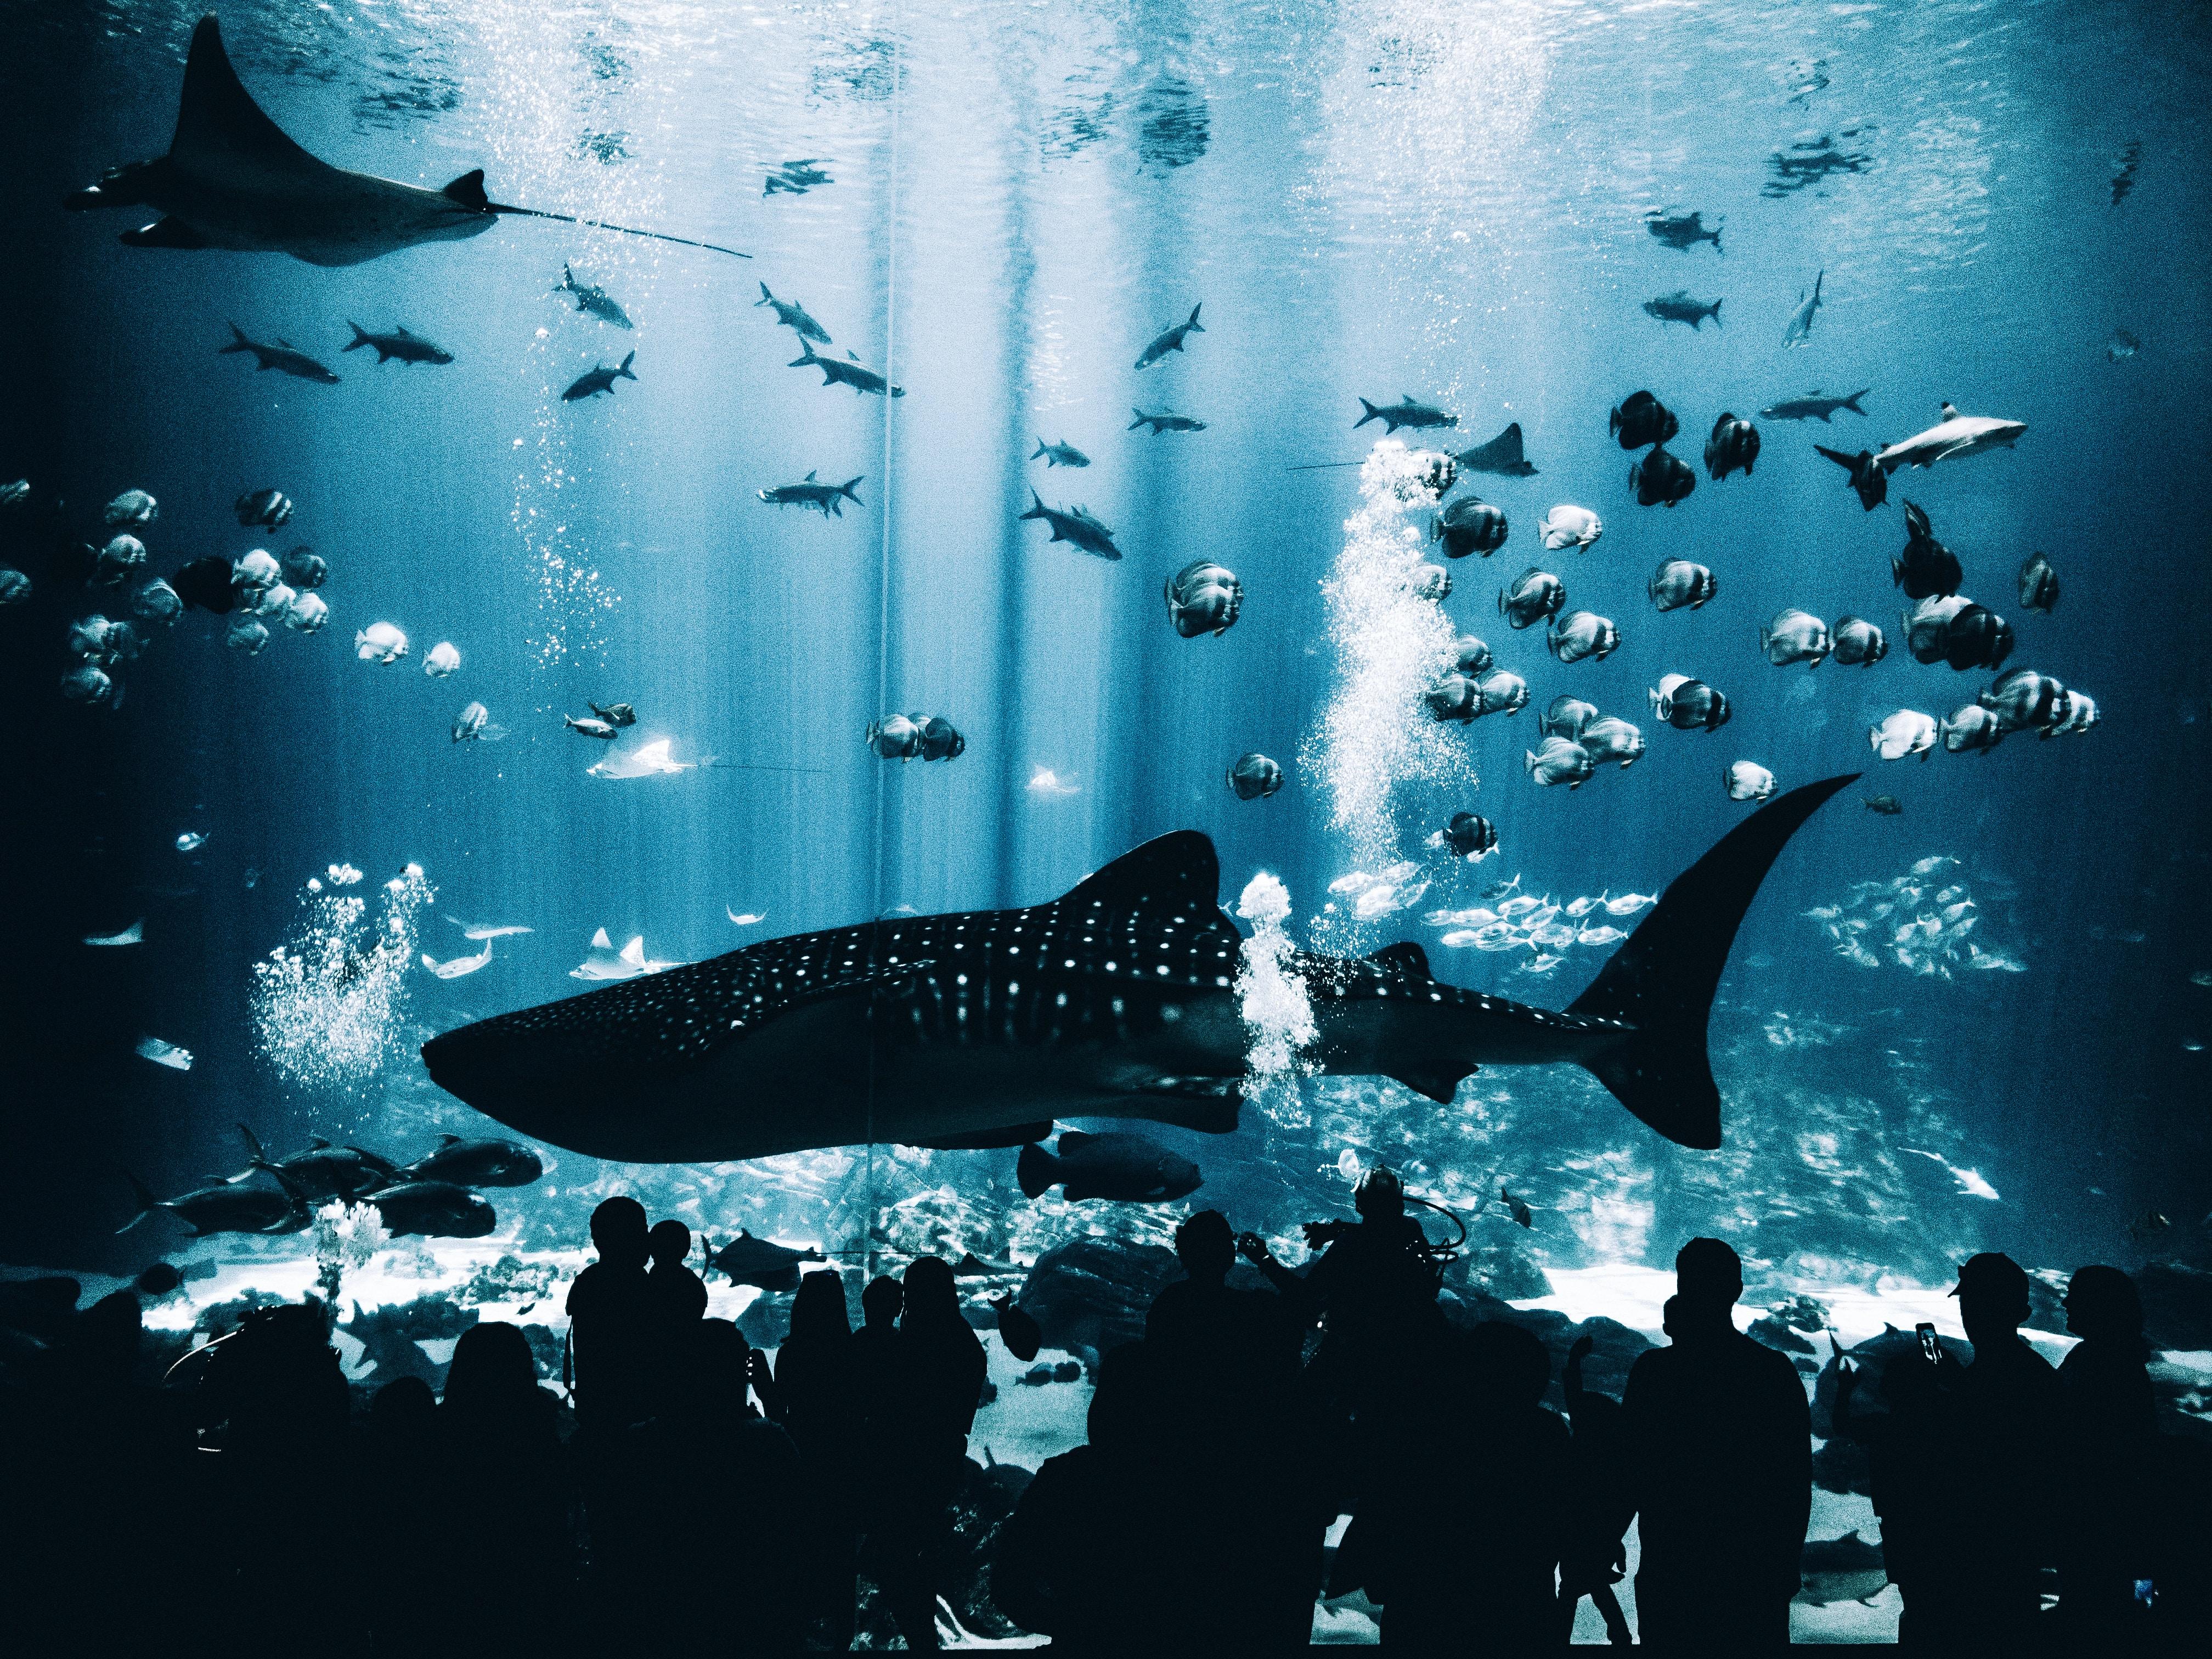 Georgia Aquarium photo by Matt Helbig (@mtthlbg) on Unsplash